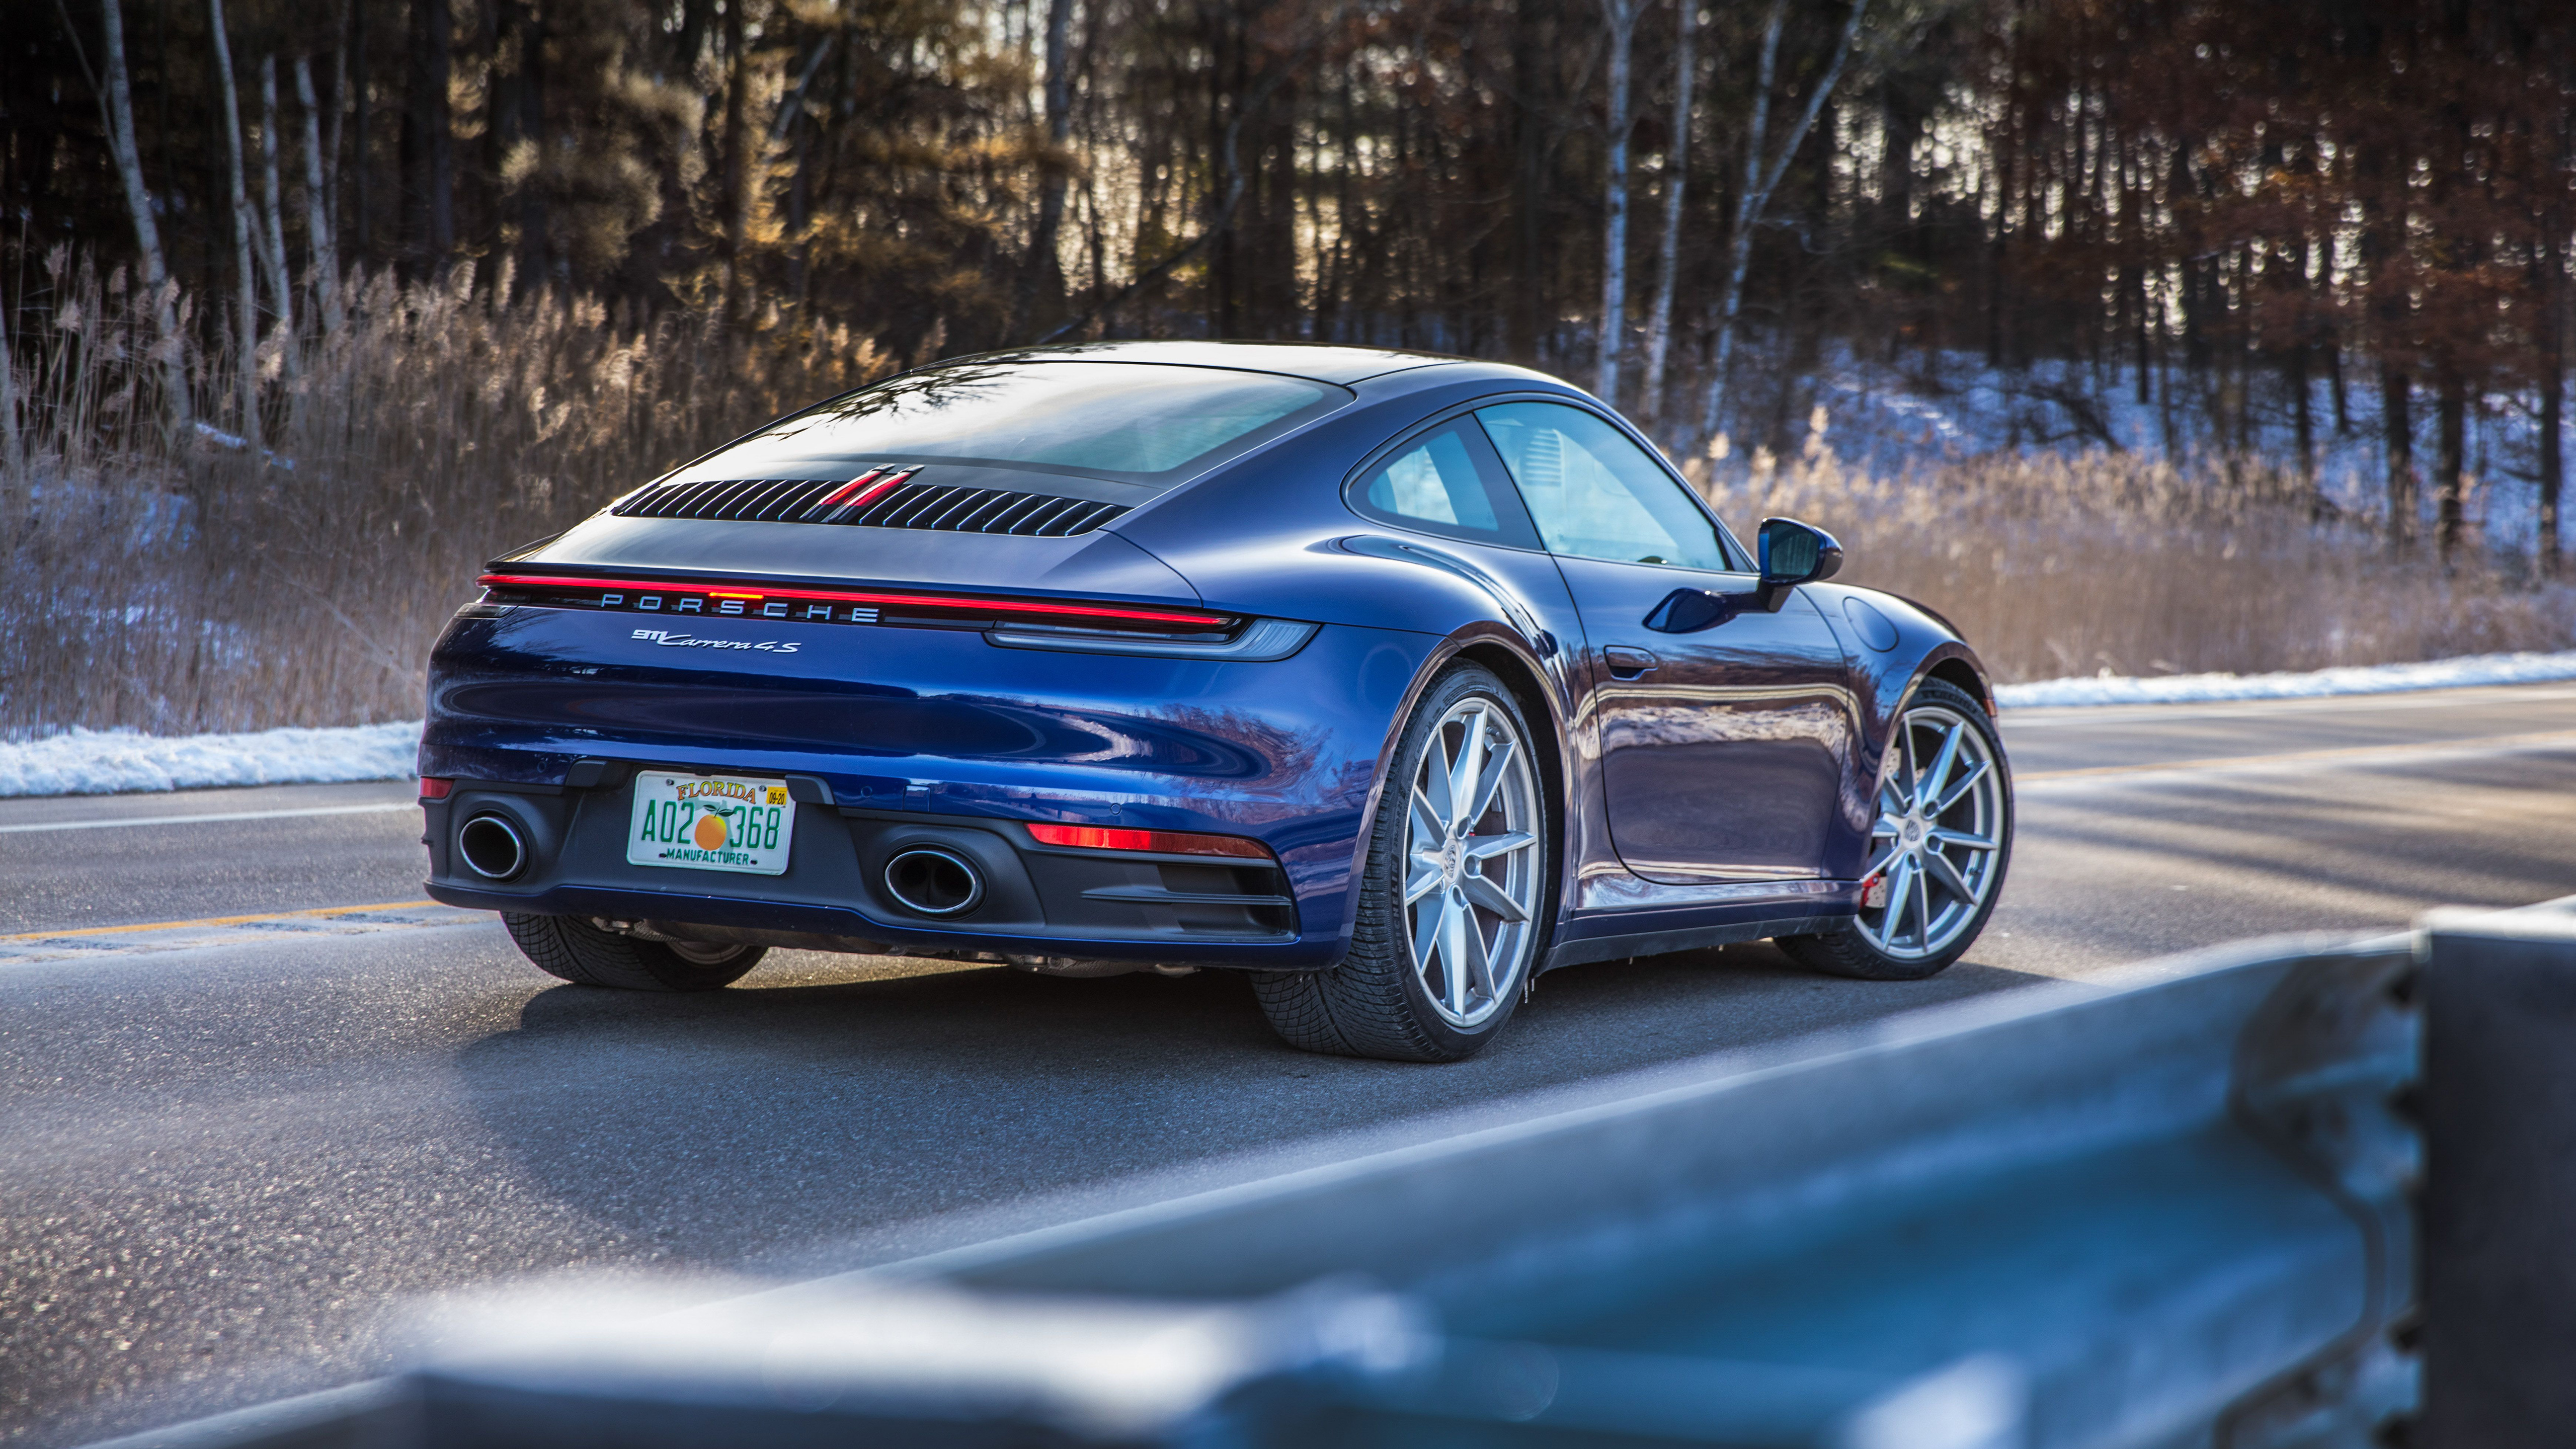 2020 Porsche 911 Carrera Spy Shoot